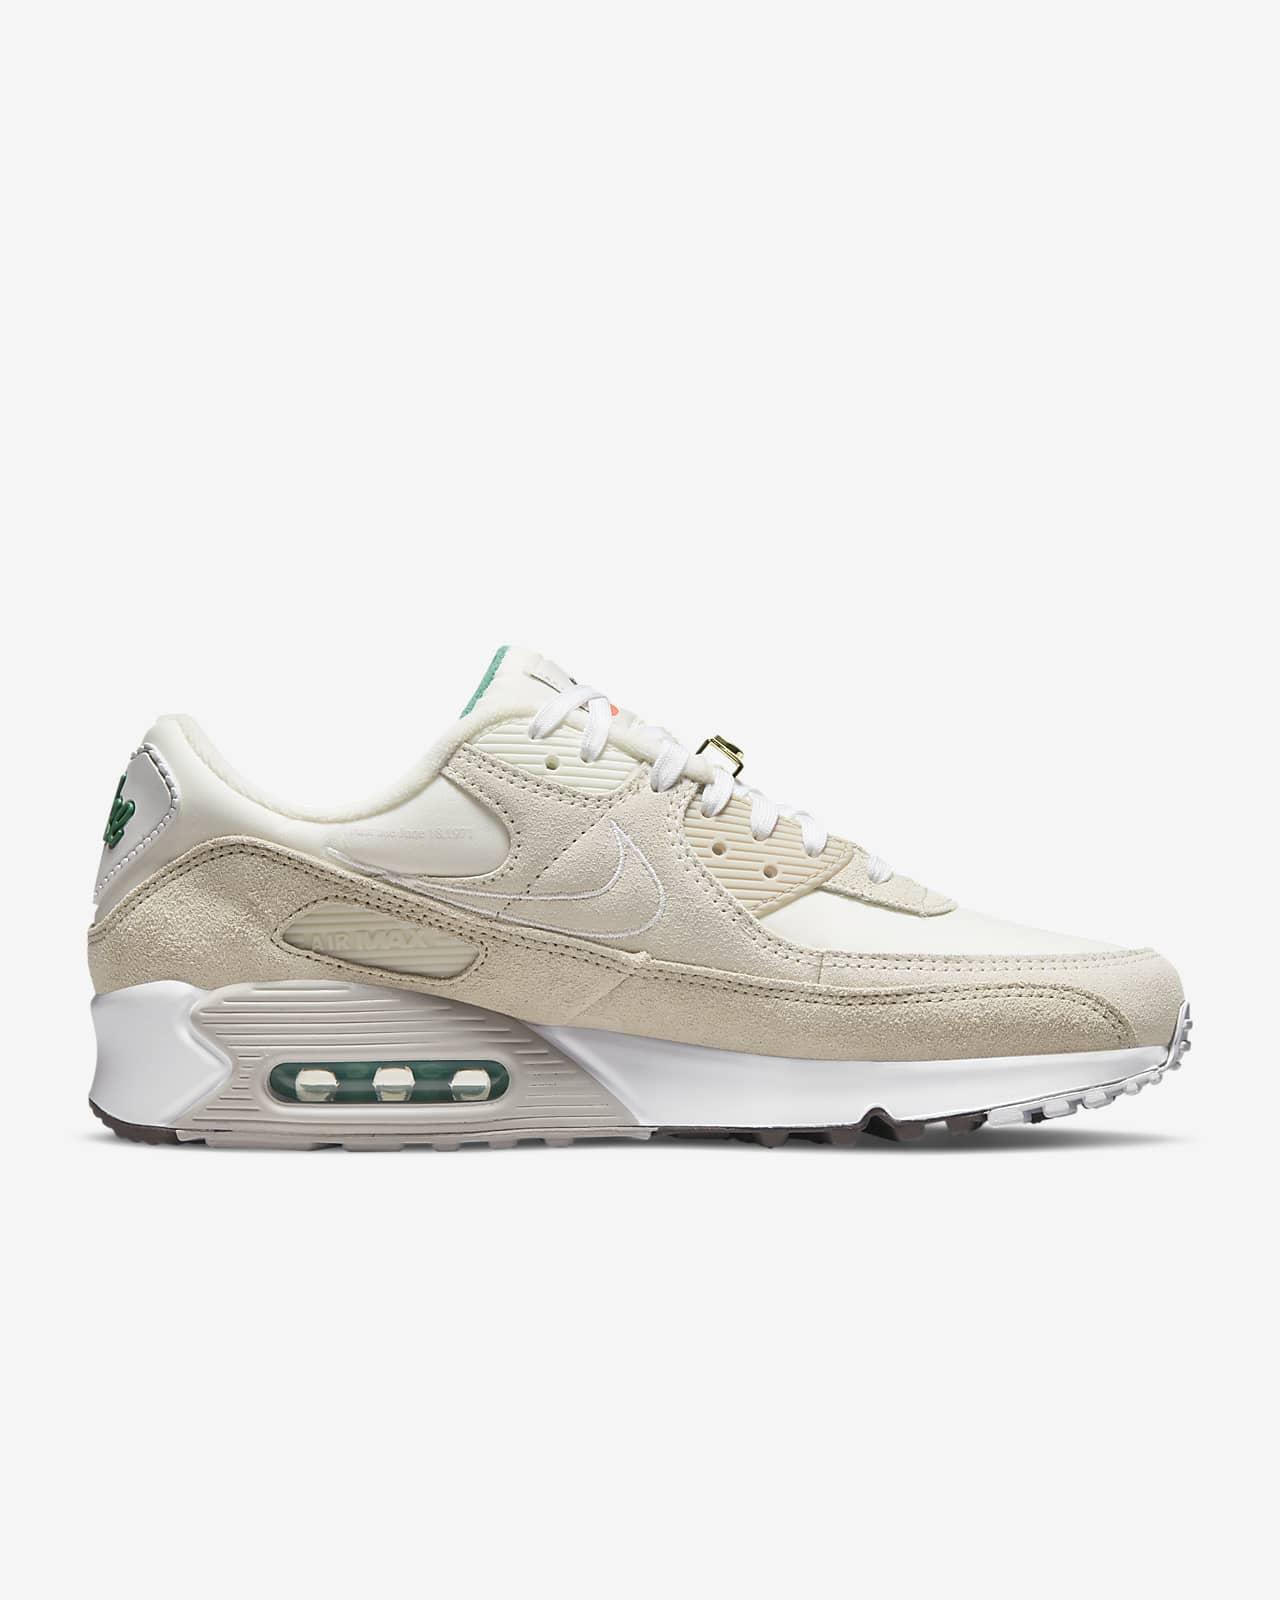 Nike Air Max 90 SE Men's Shoes